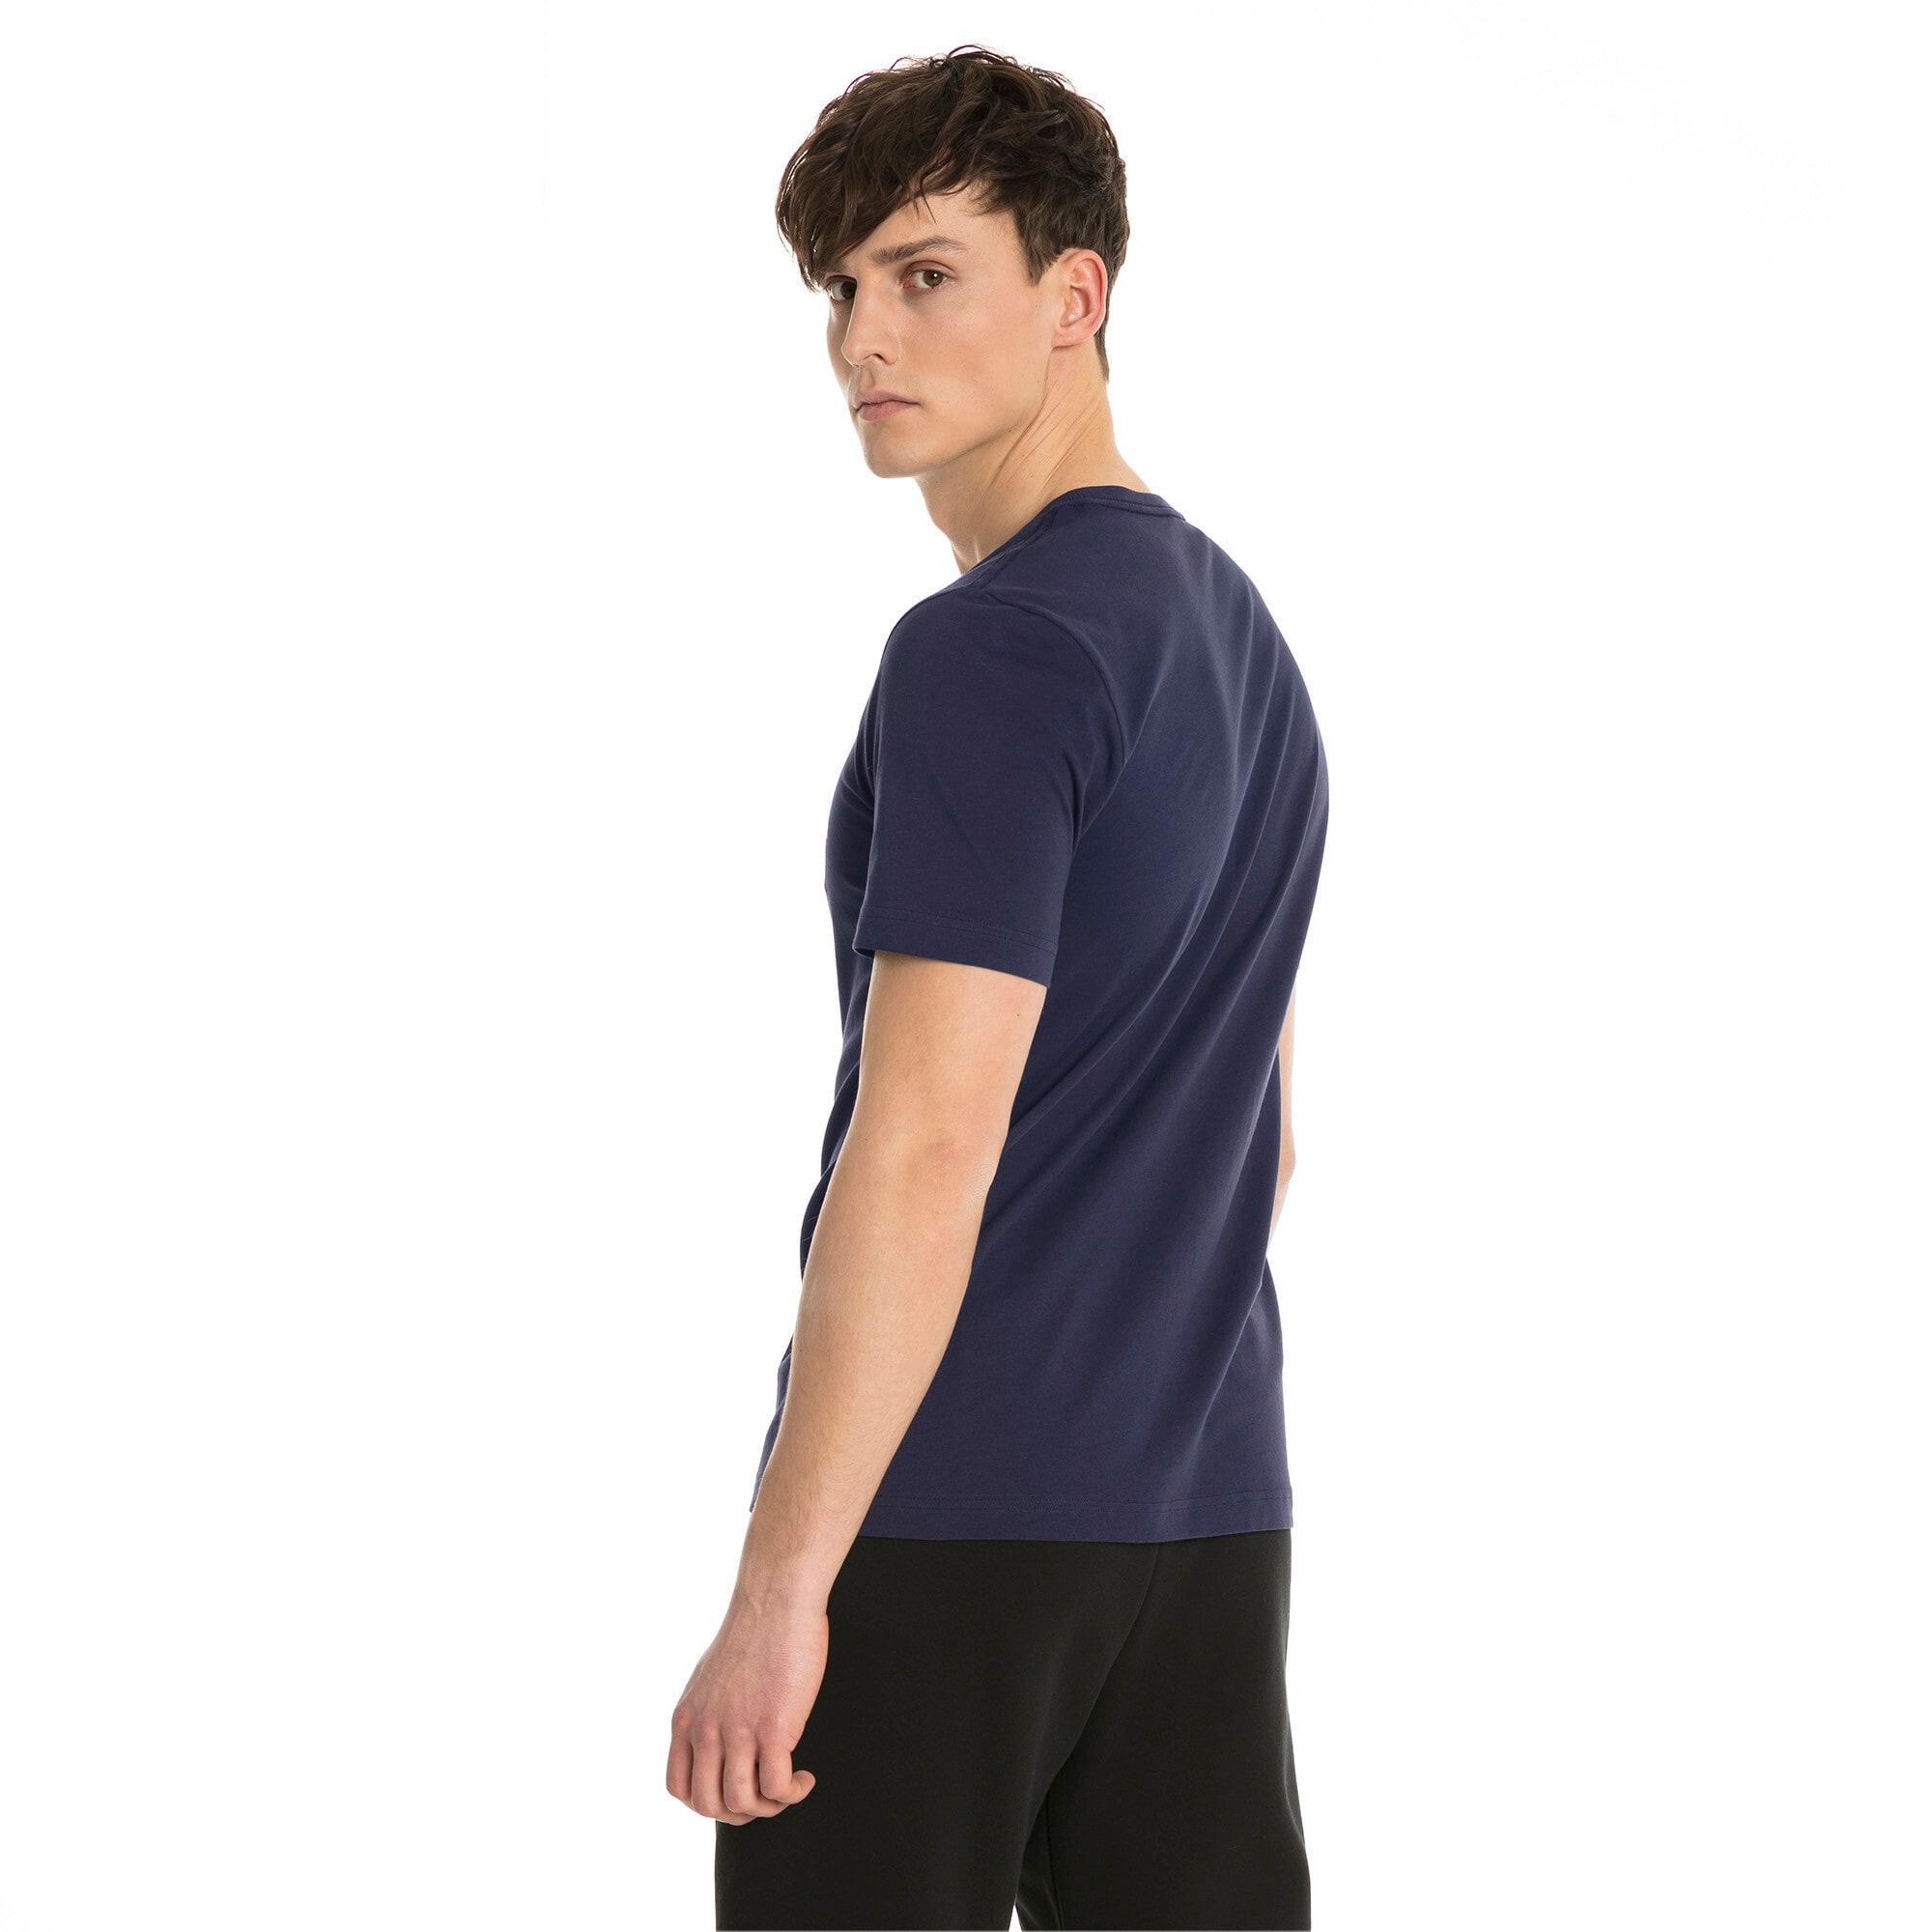 Thumbnail 2 of T-shirt a maniche corte Essentials uomo, Peacoat, medium